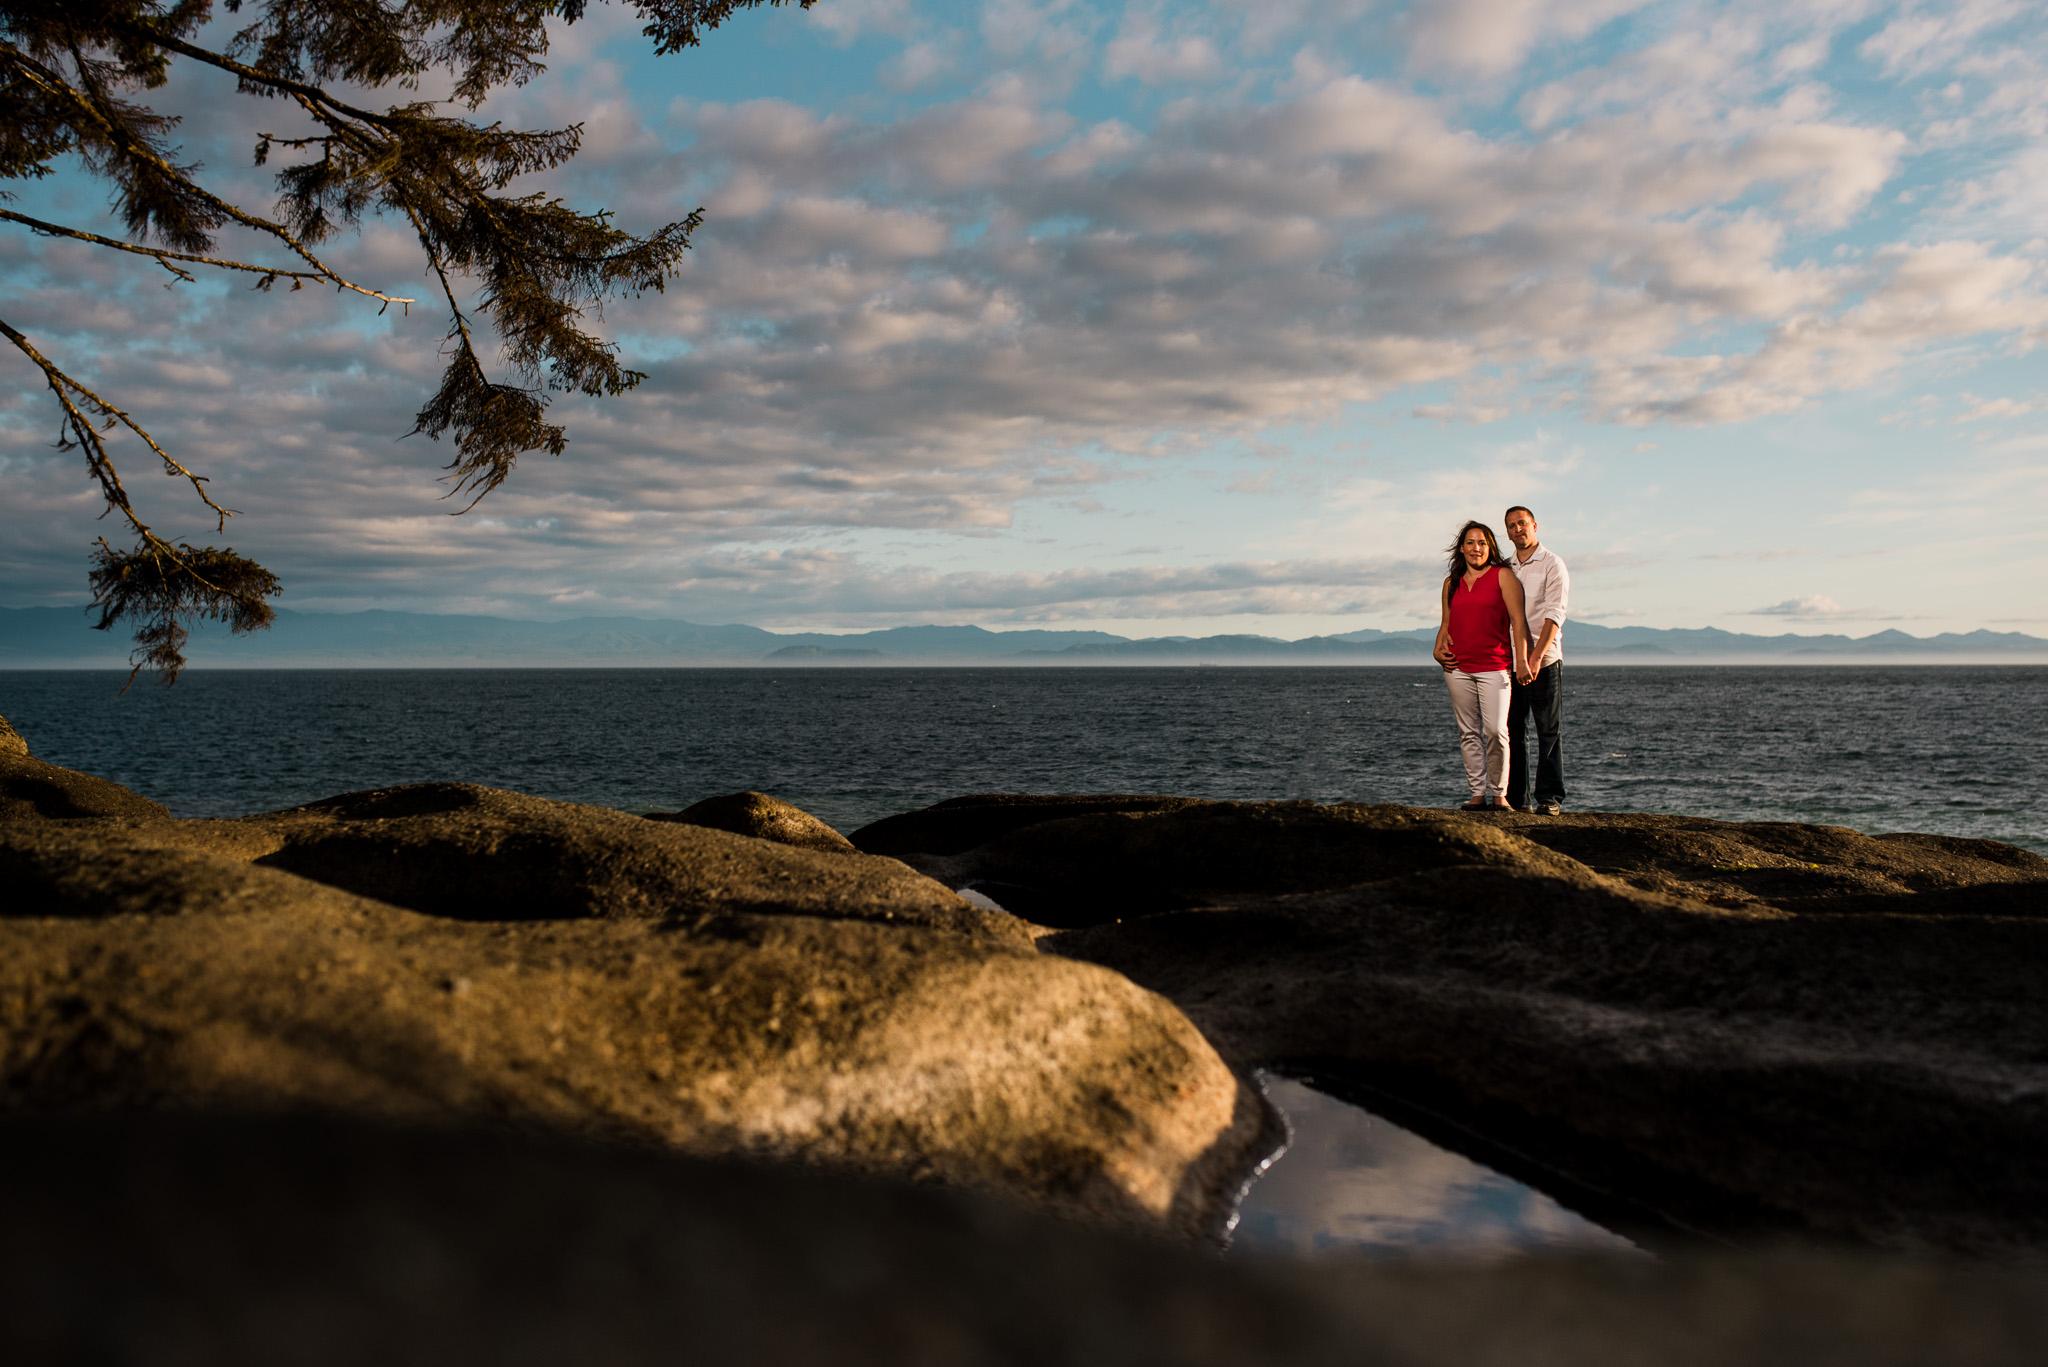 victoria-wedding-photographer-sandcut-beach-engagement-12.jpg